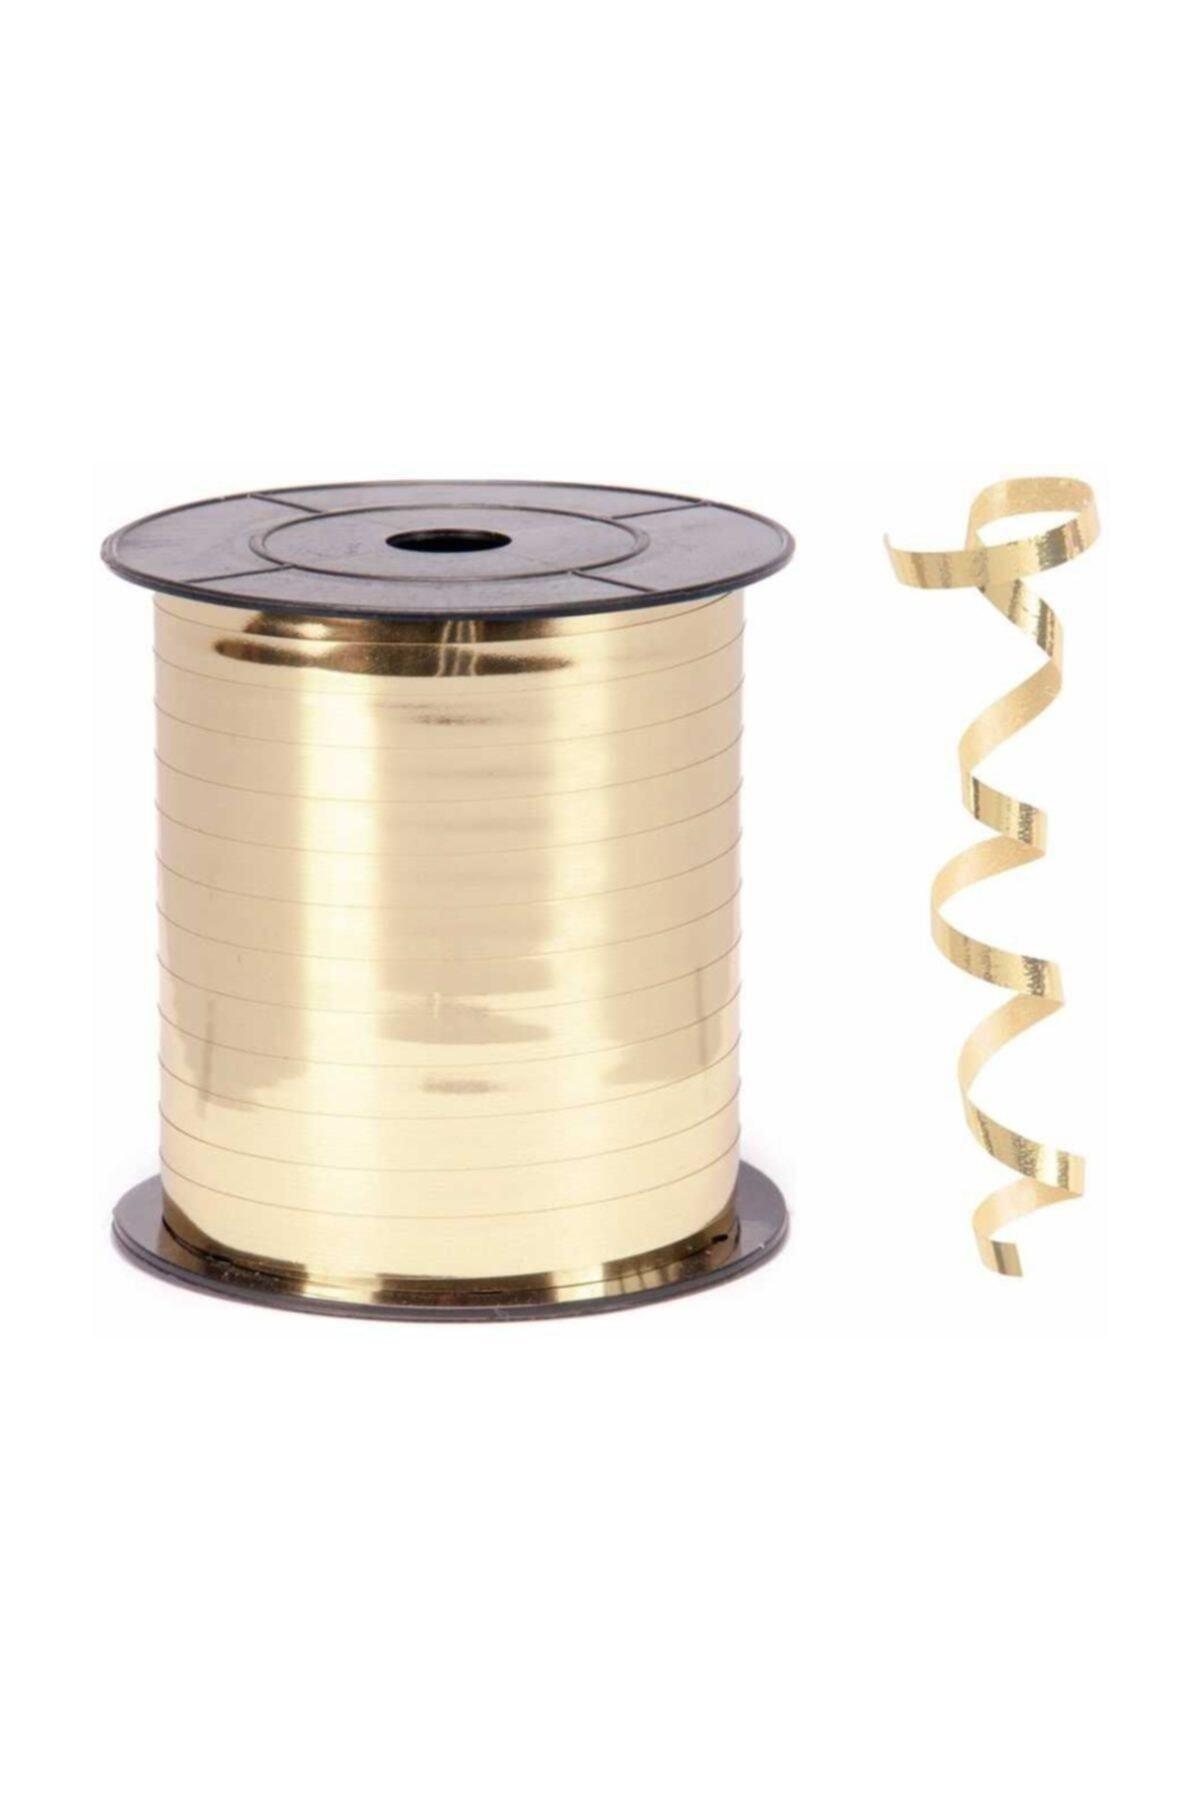 Rafya Metalik Altın Gold 5 Mm 200 Metre